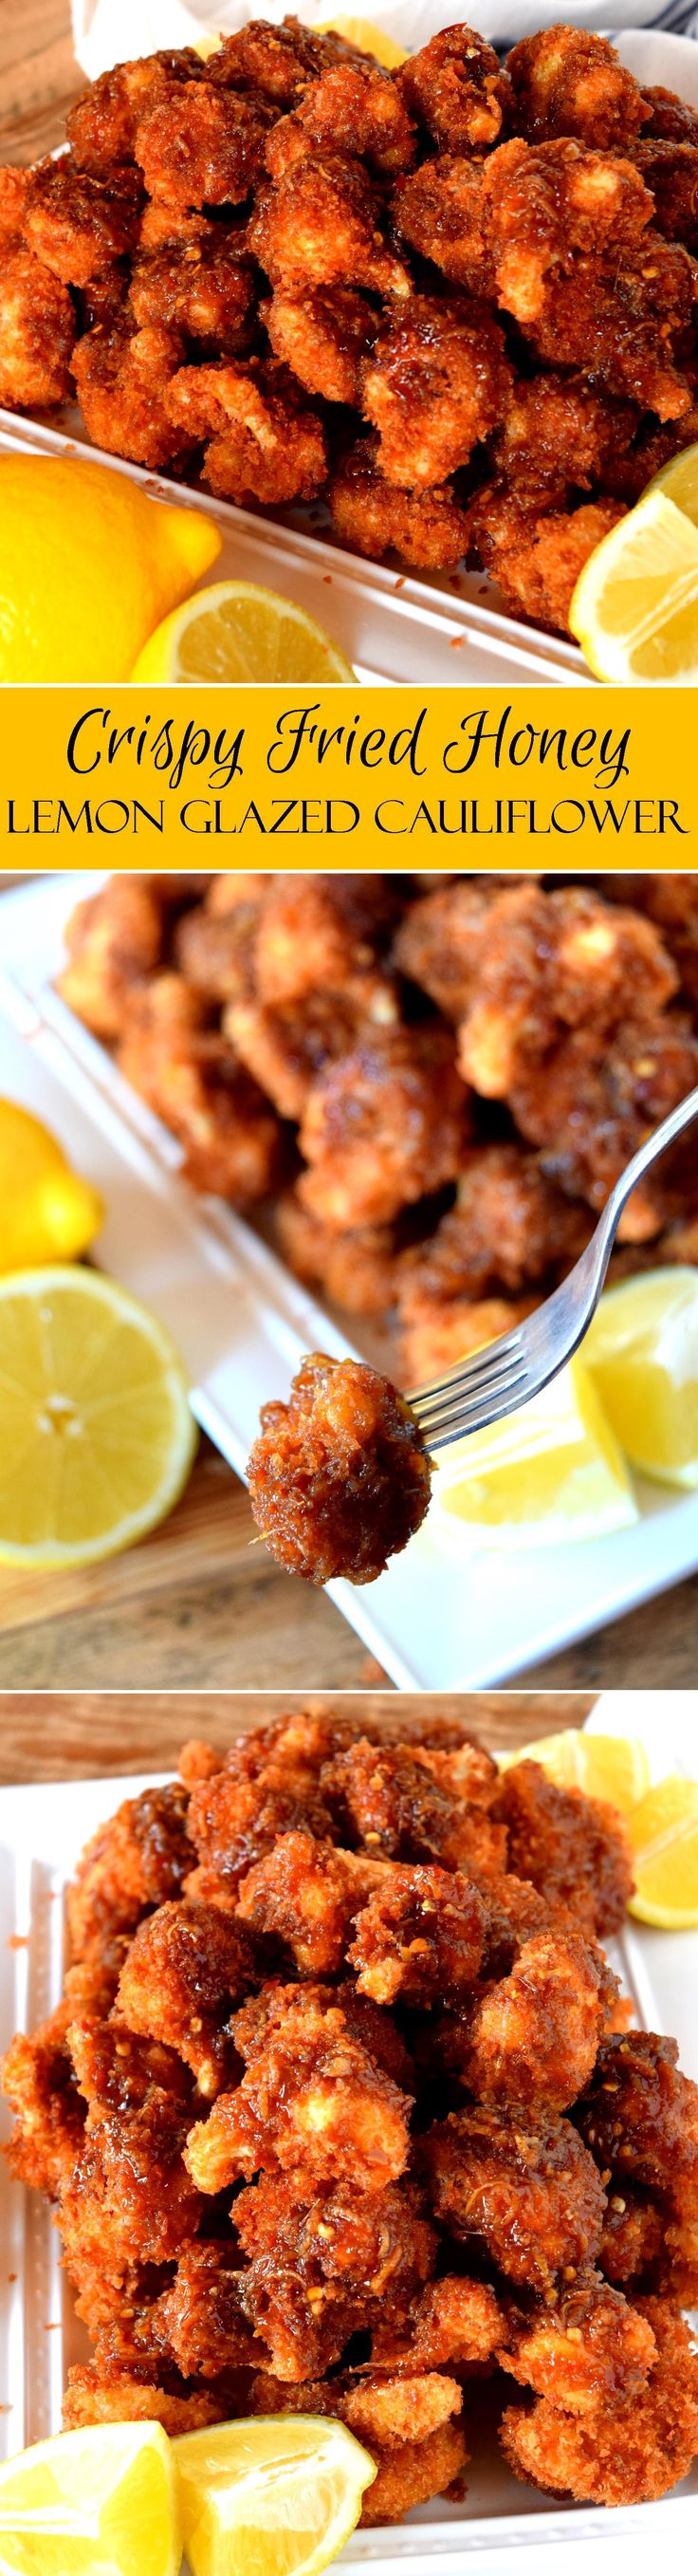 Crispy Fried Honey Lemon Glazed Cauliflower